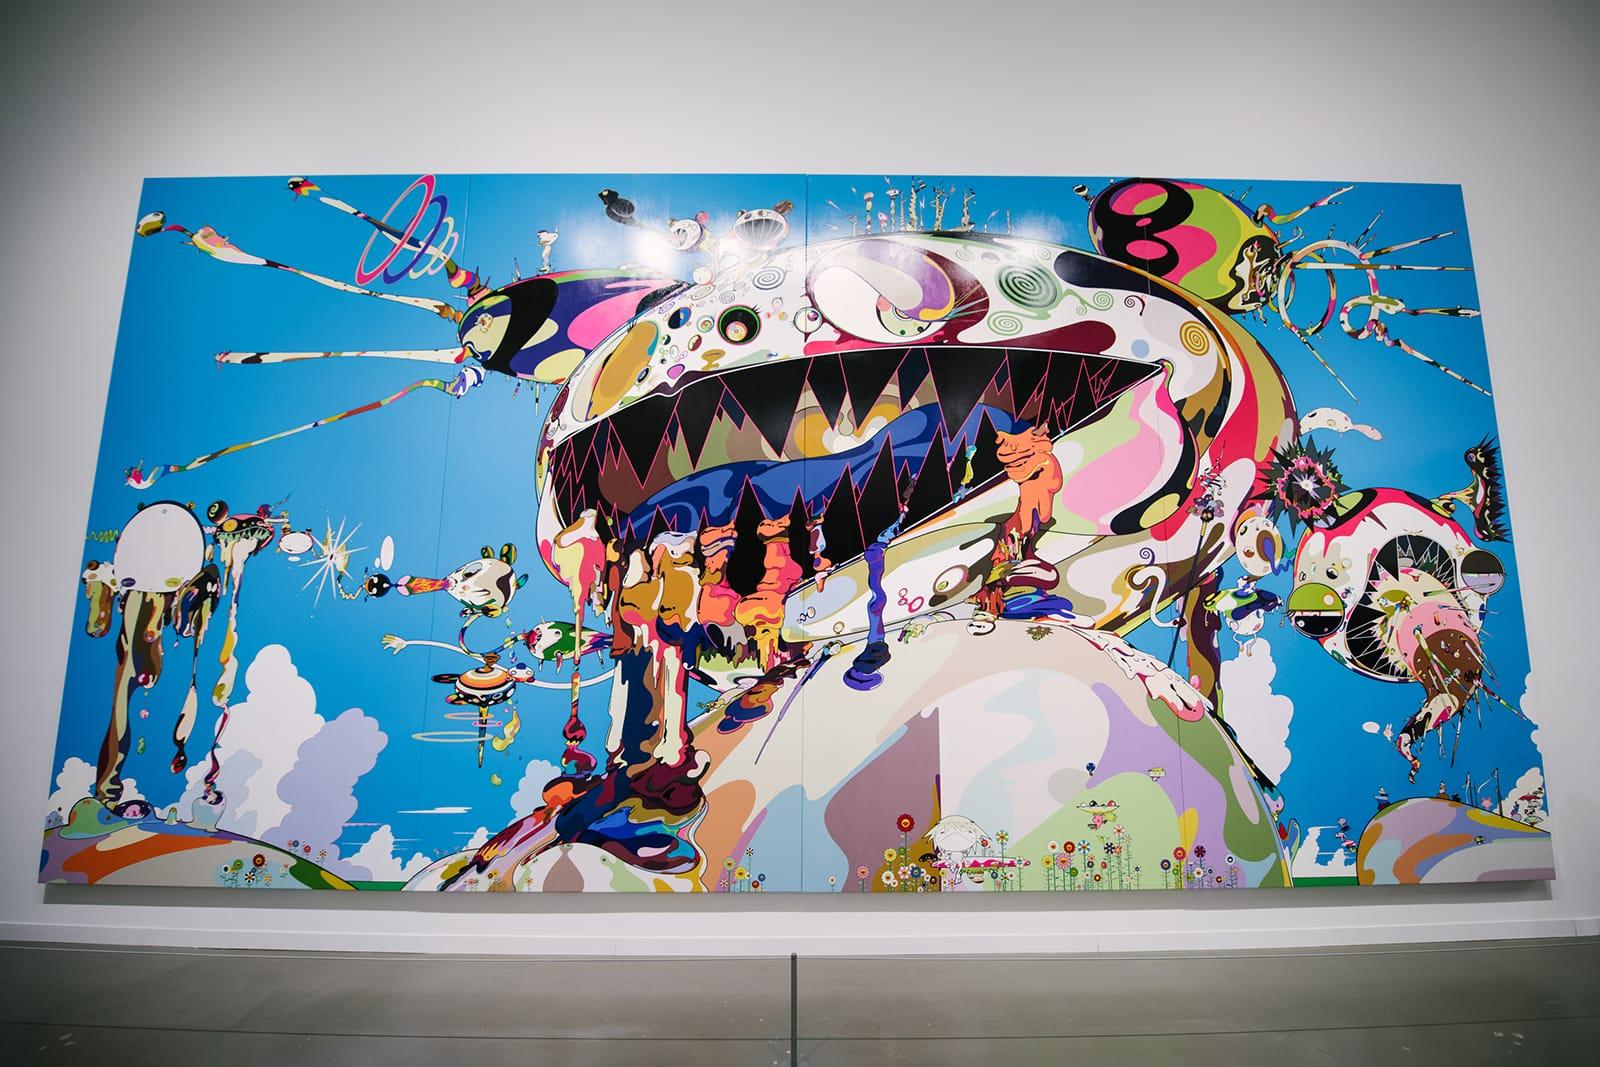 TAKASHI MURAKAMI OCTOPUS EATS ITS OWN LEGS METALLIC PRINT FRAMED 12 x 18